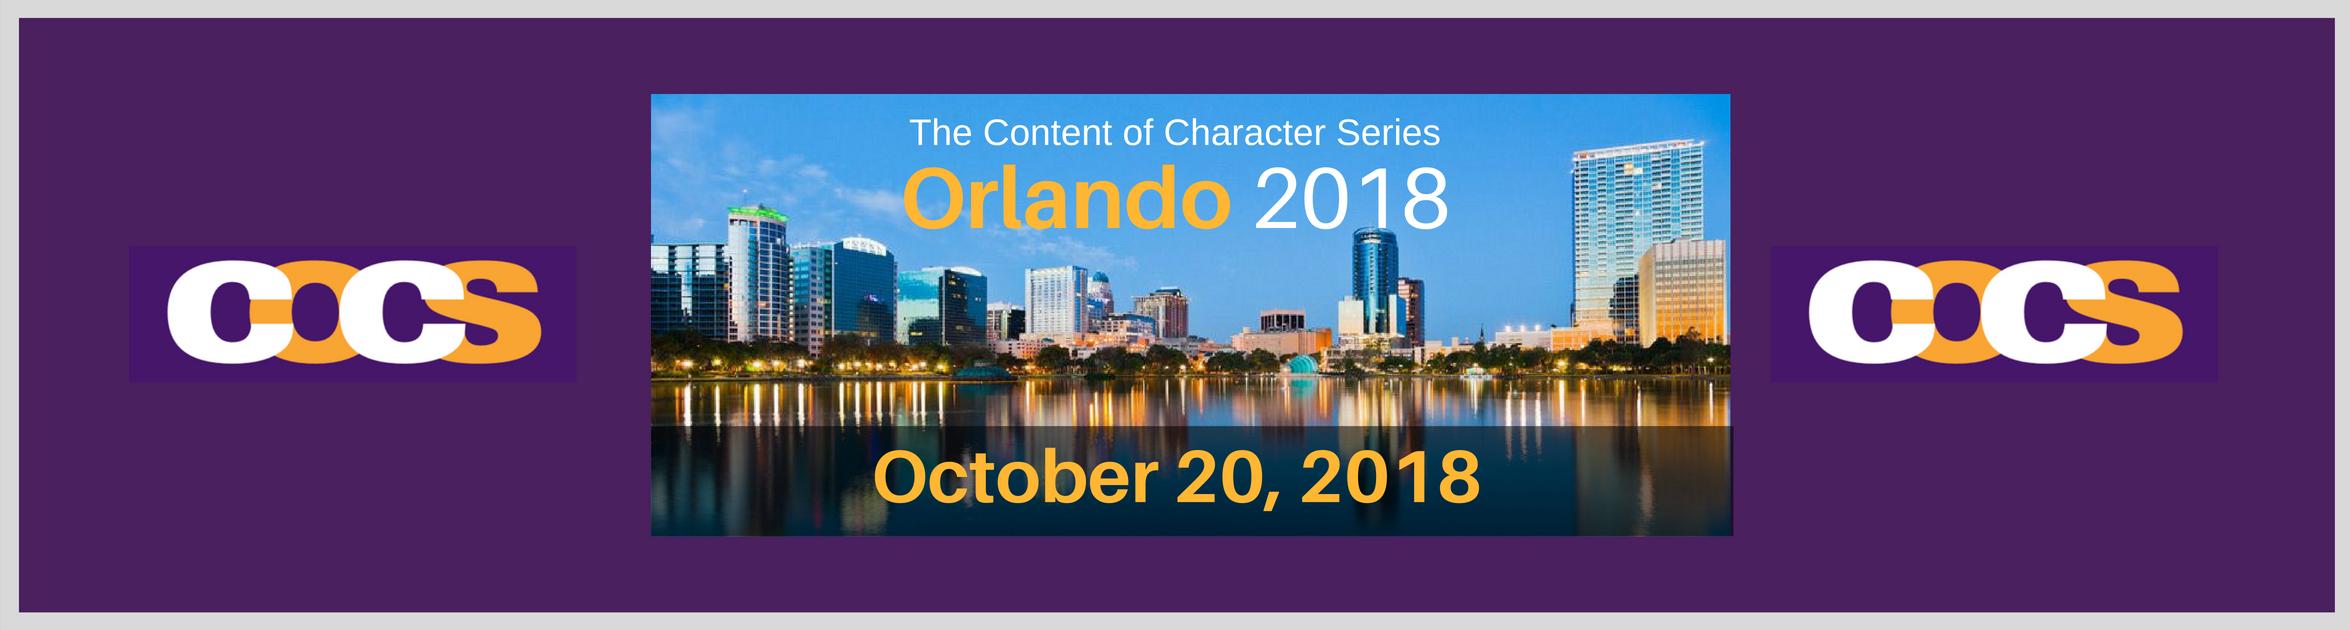 Orlando COCS Event 2018.png